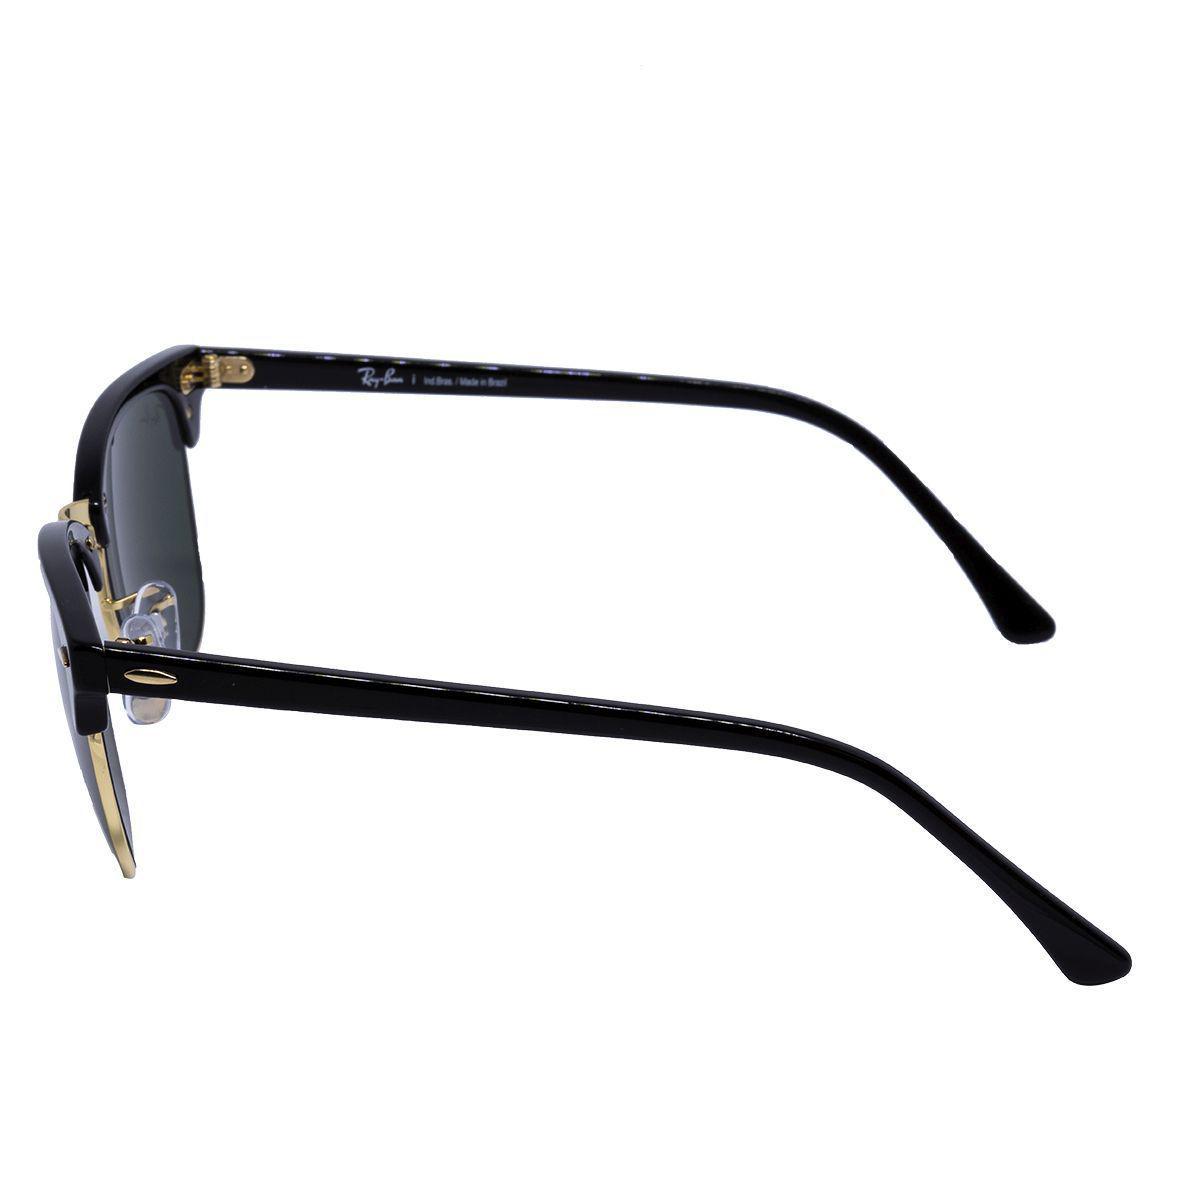 b03c0d40ff088 Óculos de Sol Ray Ban Clubmaster RB3016L CW0365 - metal dourado acetato  preto, lente cinza crystal R  526,00 à vista. Adicionar à sacola